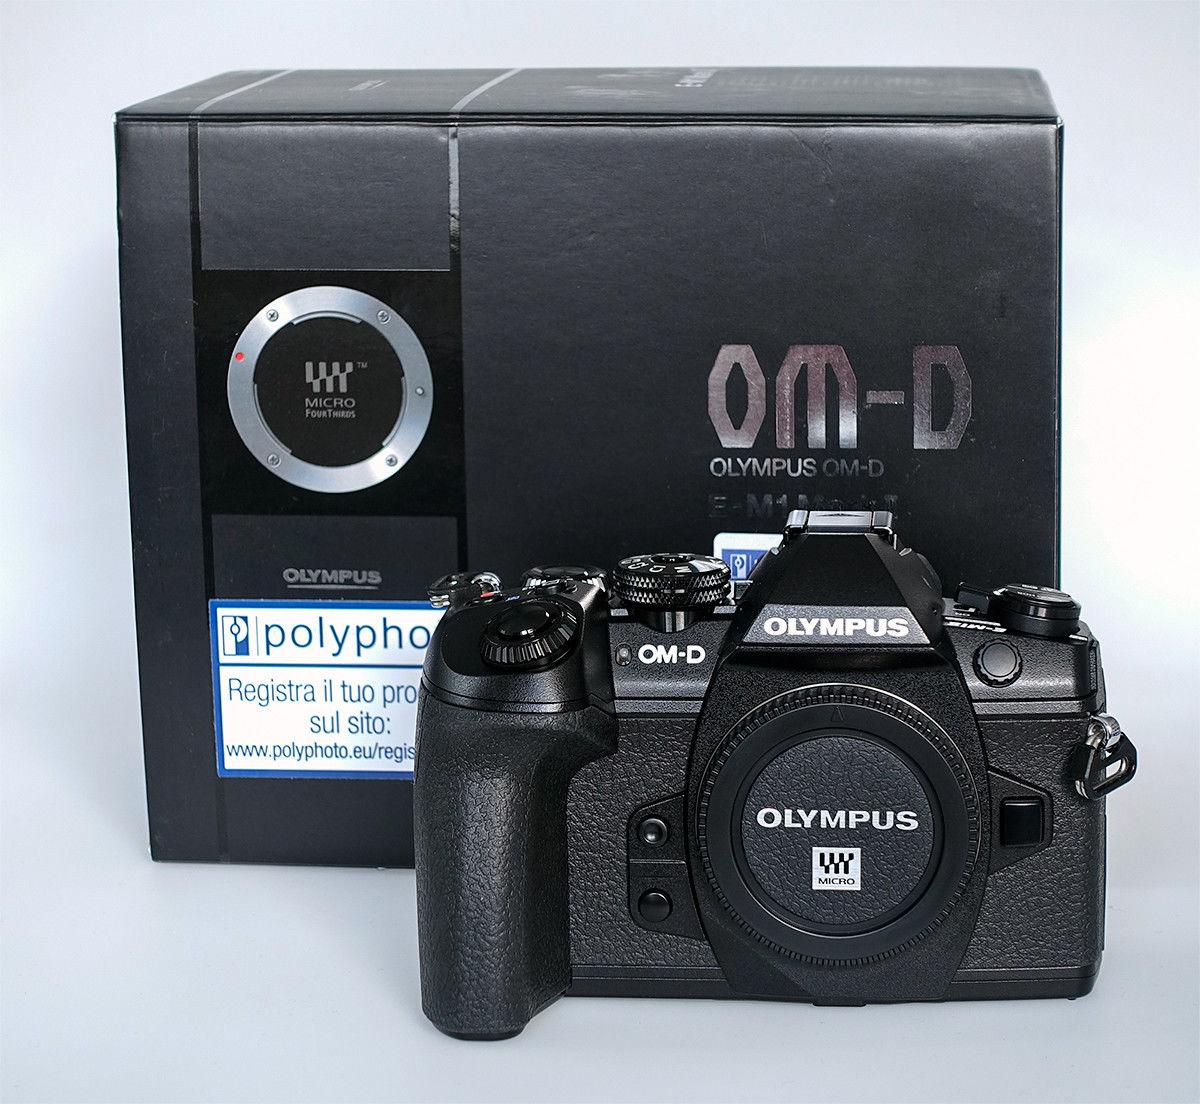 Olympus OM-D E-M1 Mark II – Gehäuse (Body) schwarz - wie neu - TOP!